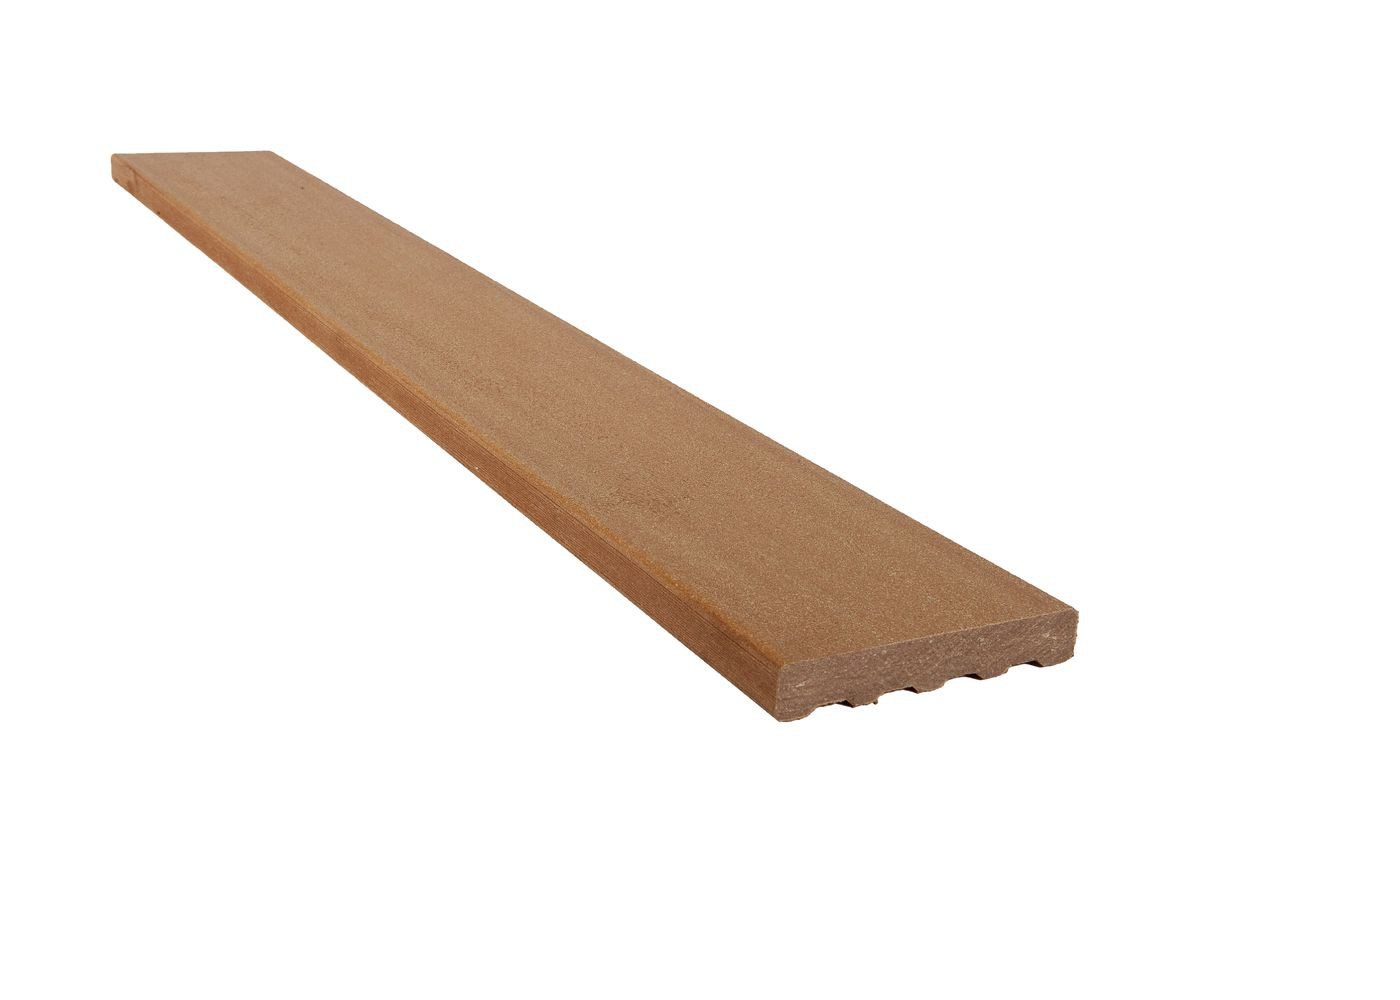 Planche de finition composite Brun Colorado